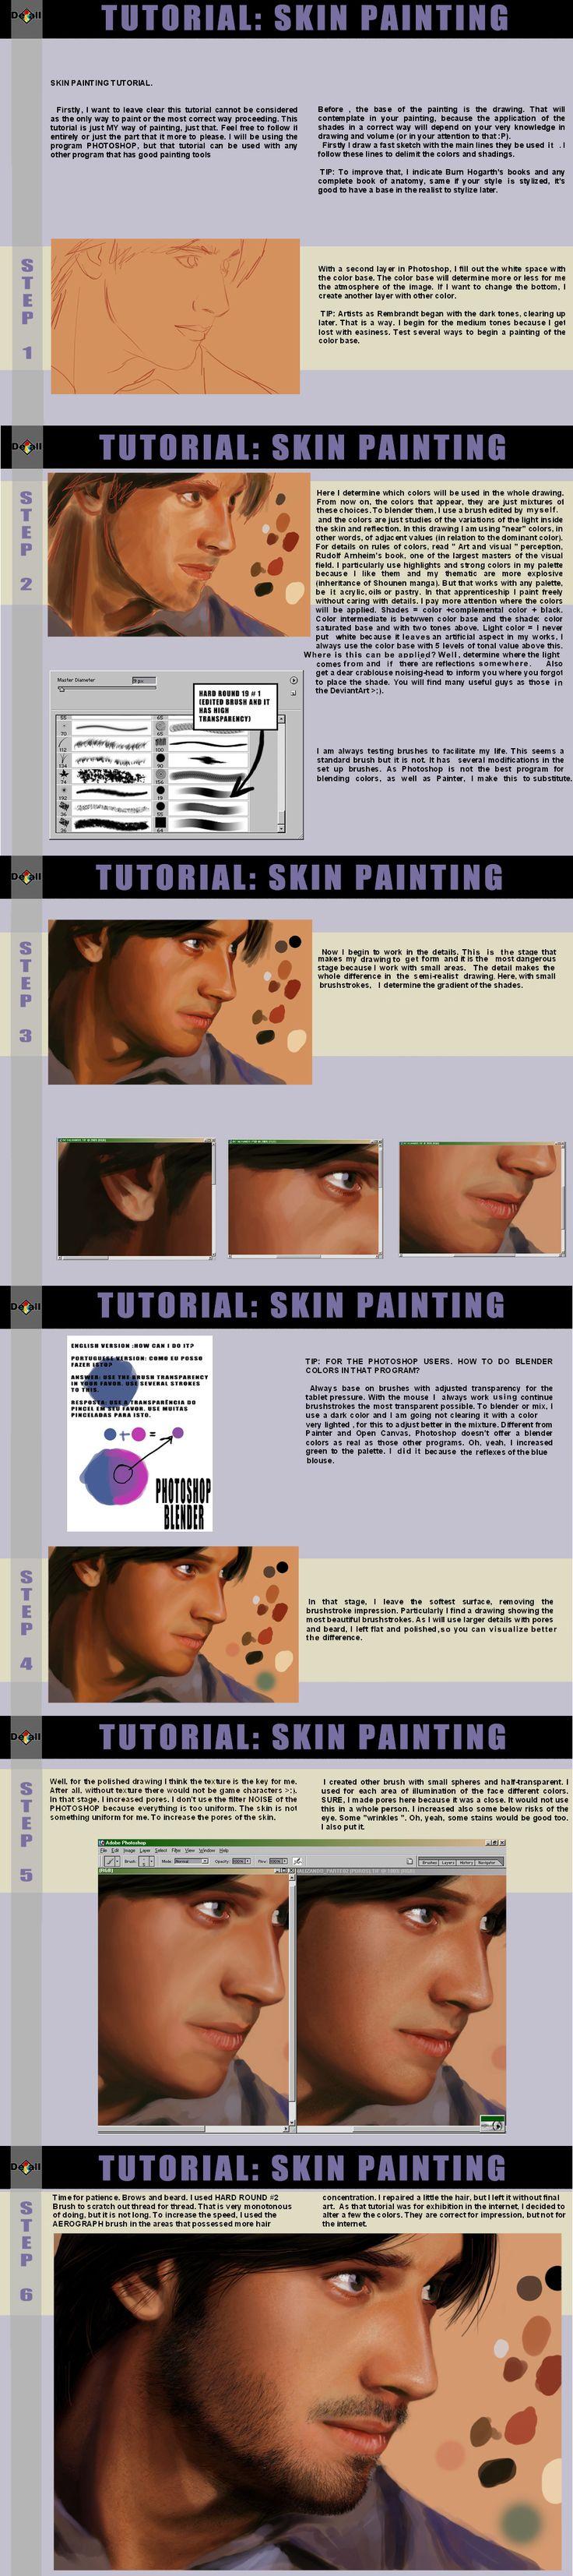 Skin painting tut